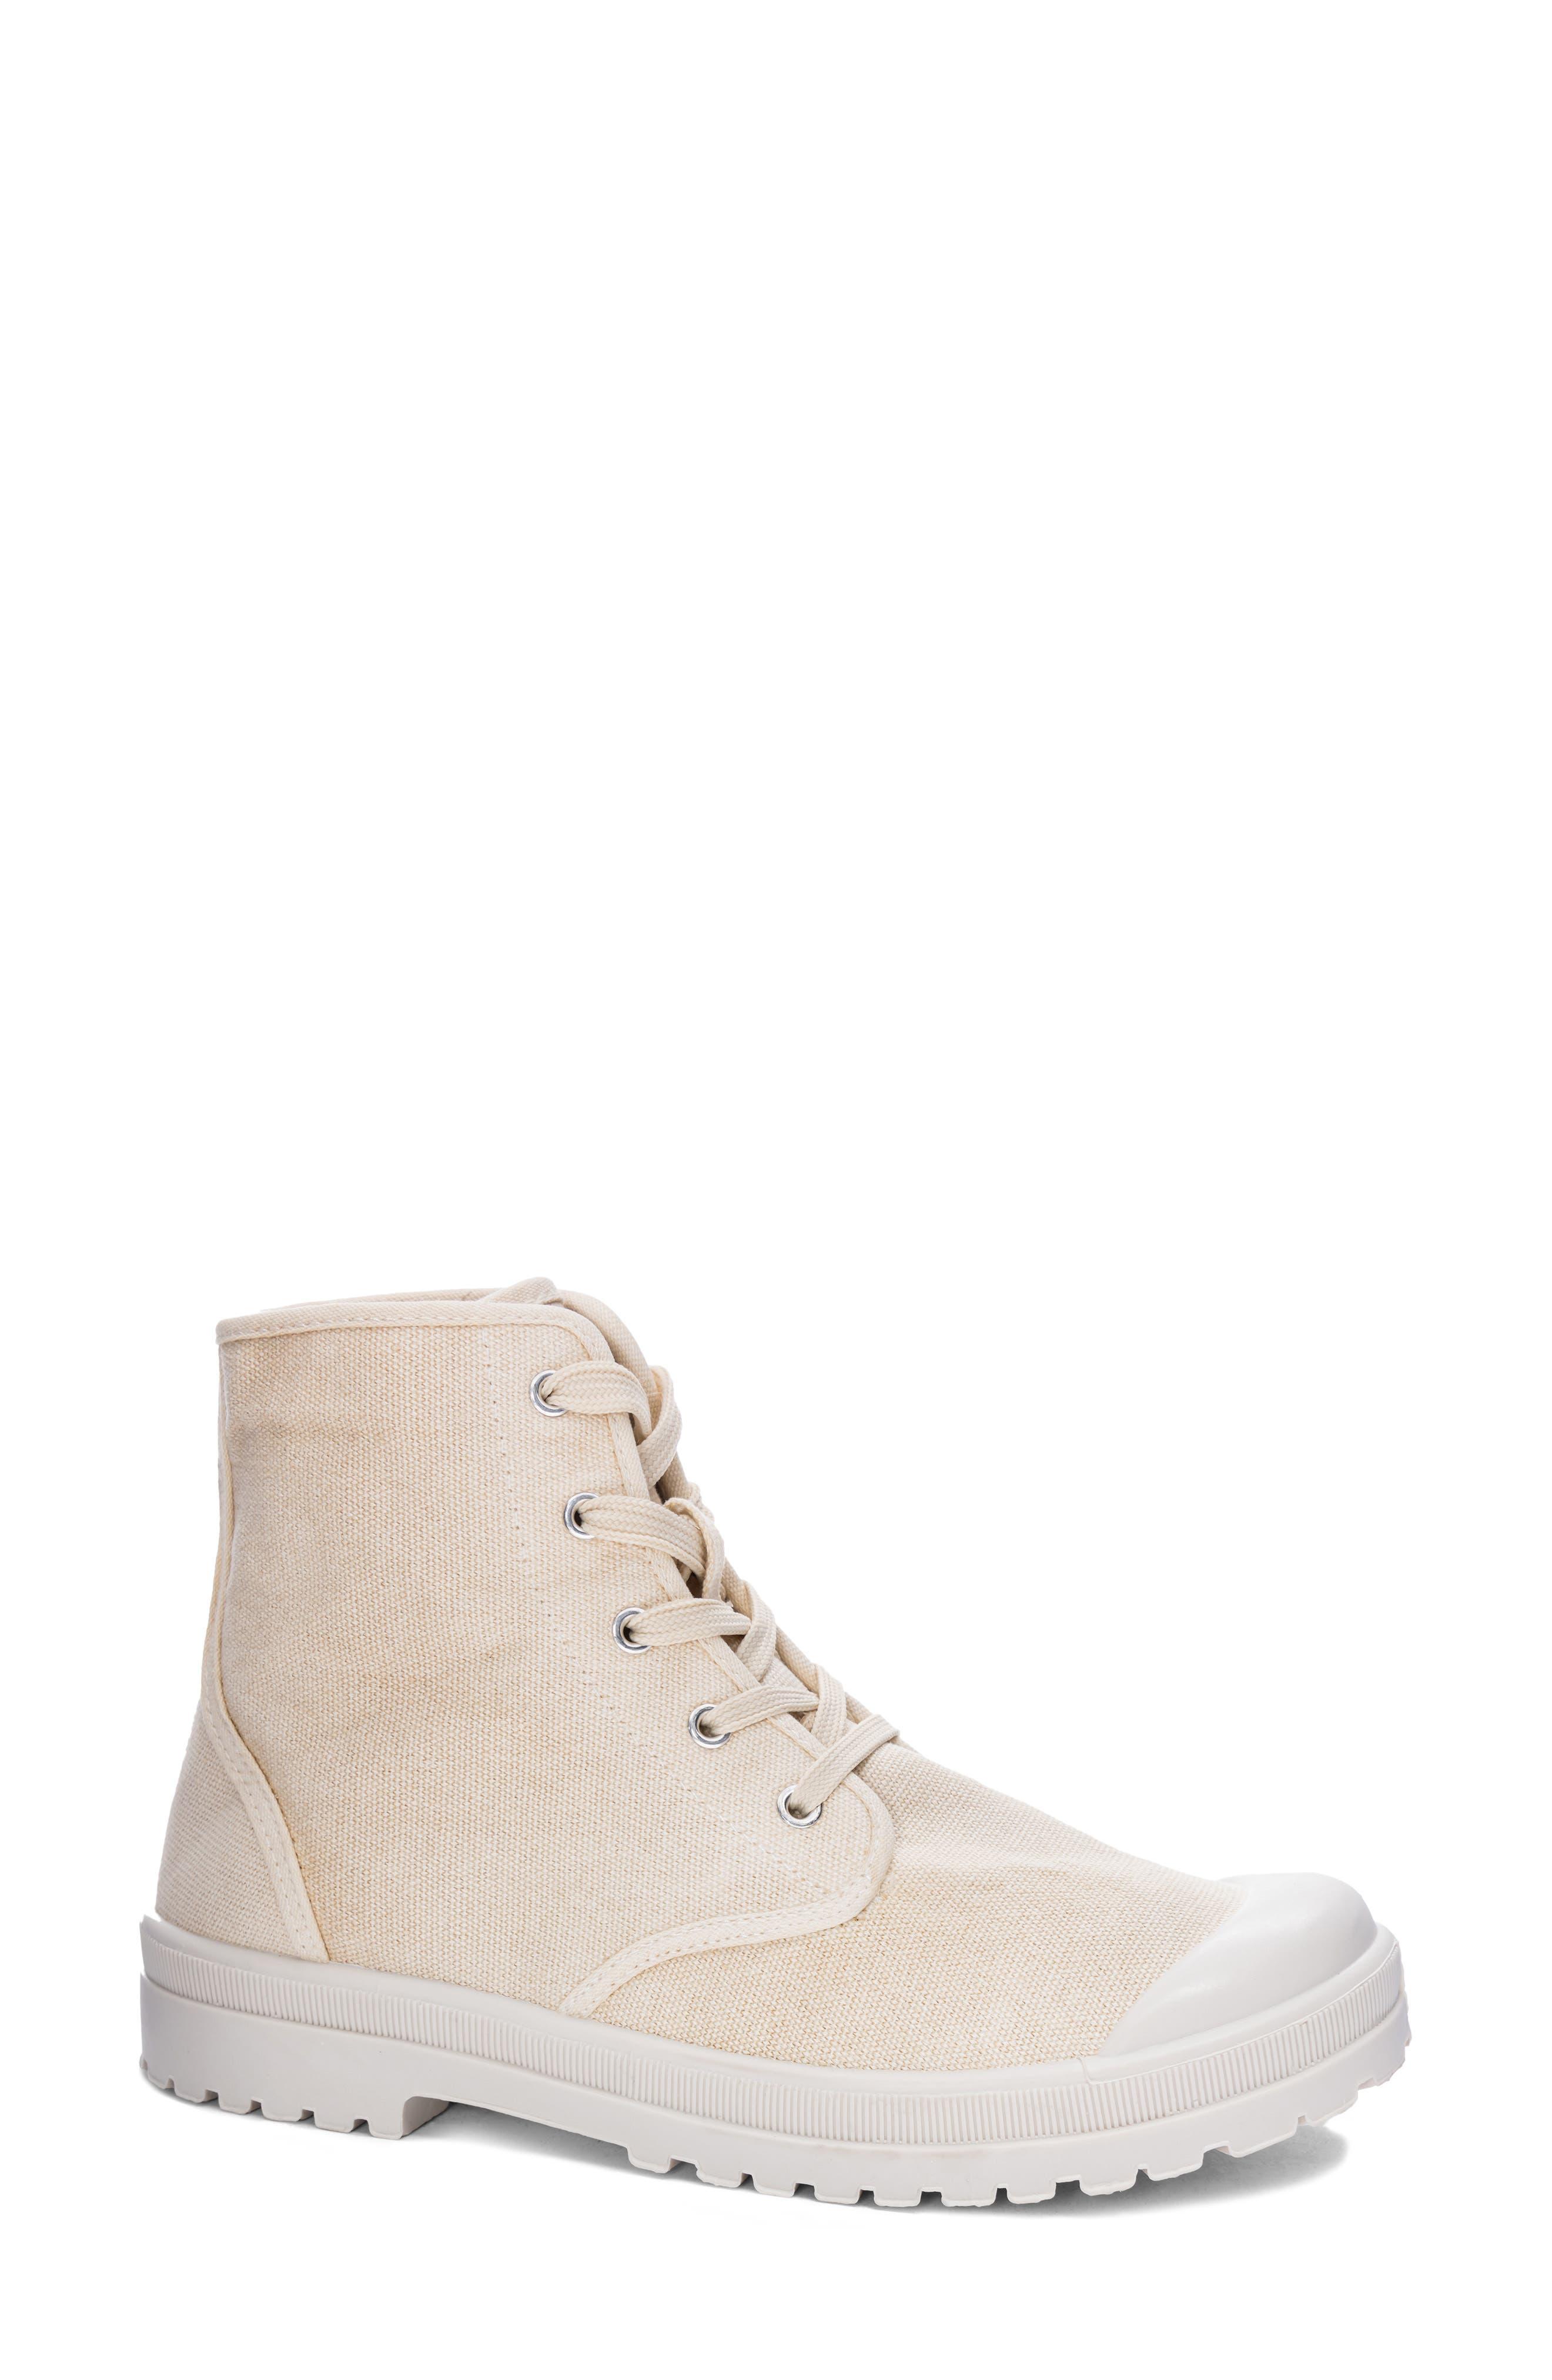 Pixies High Top Sneaker